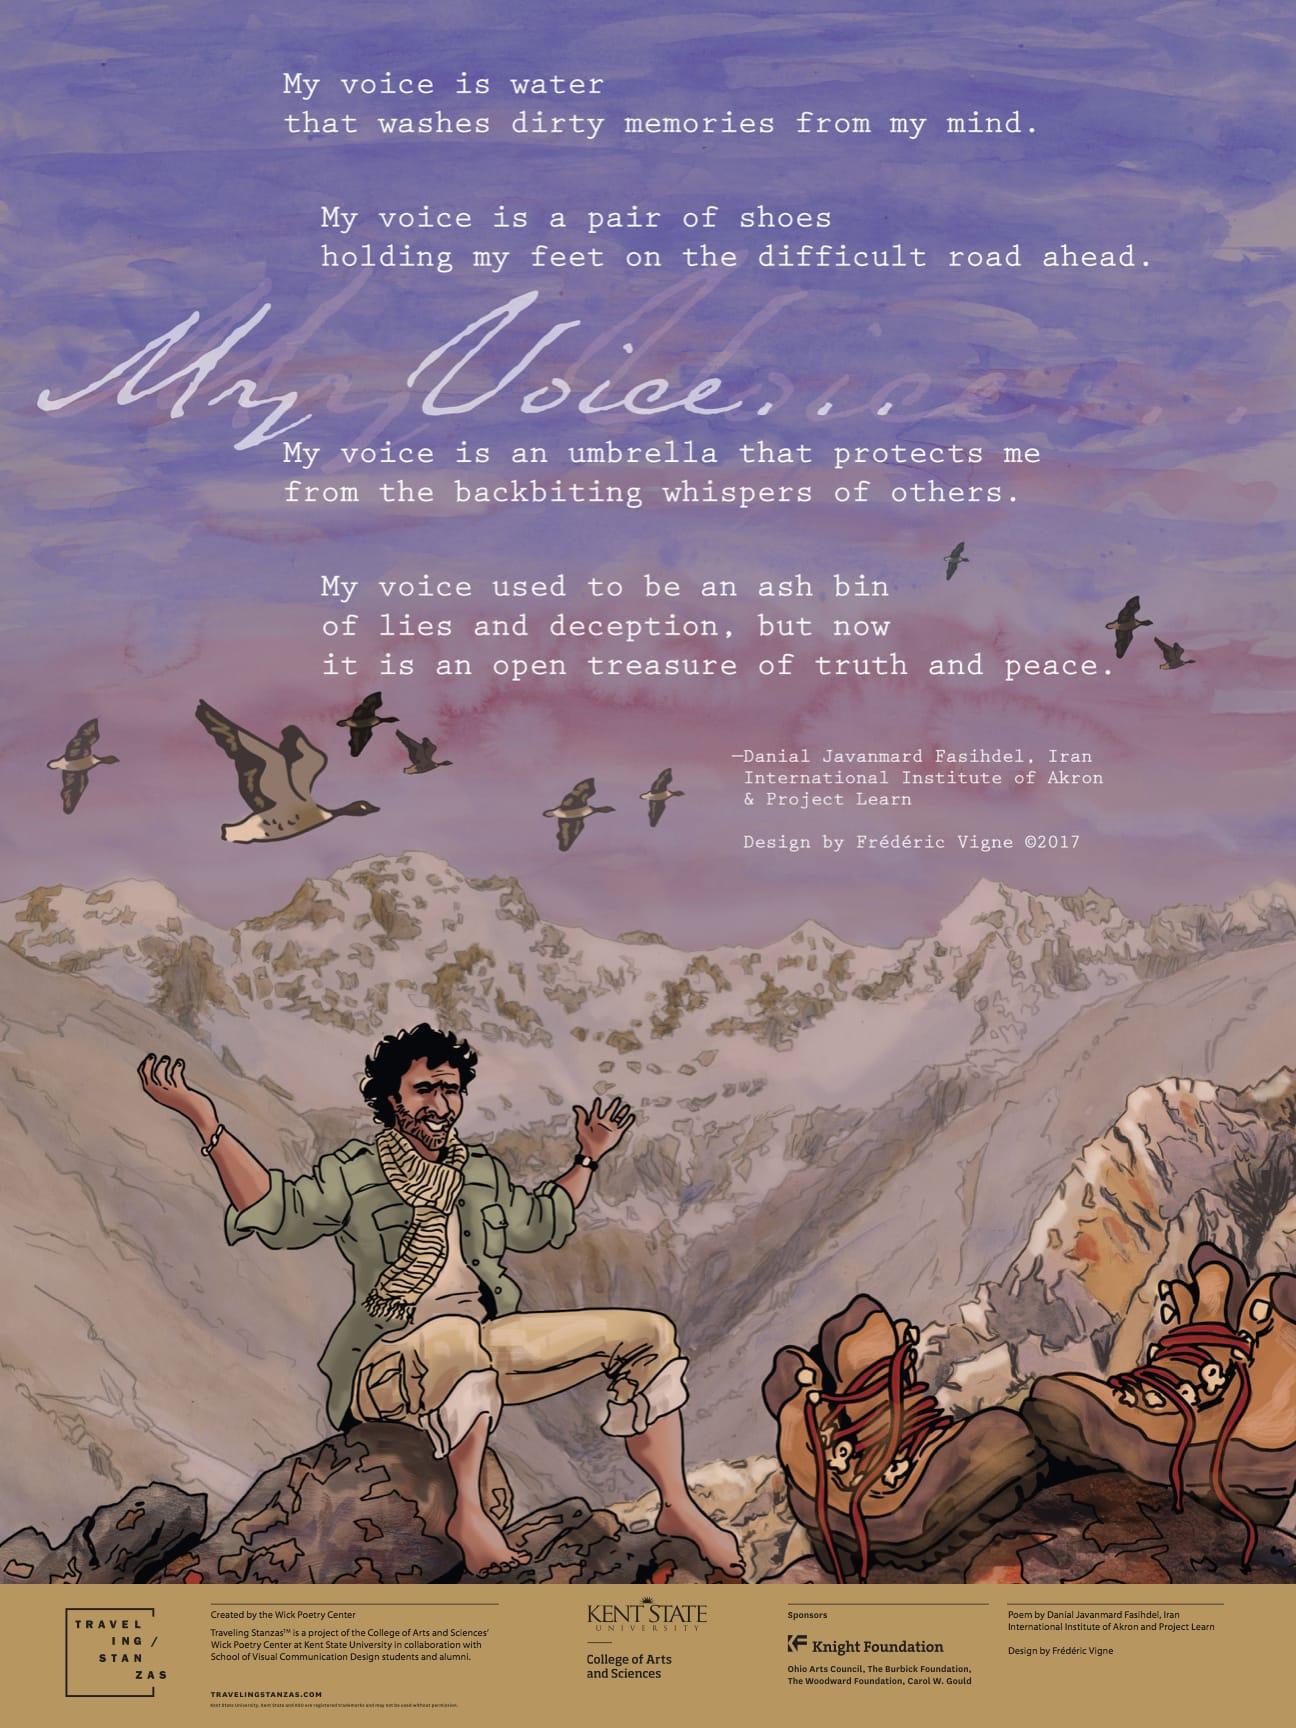 MyVoice-Fasihdel-Poster